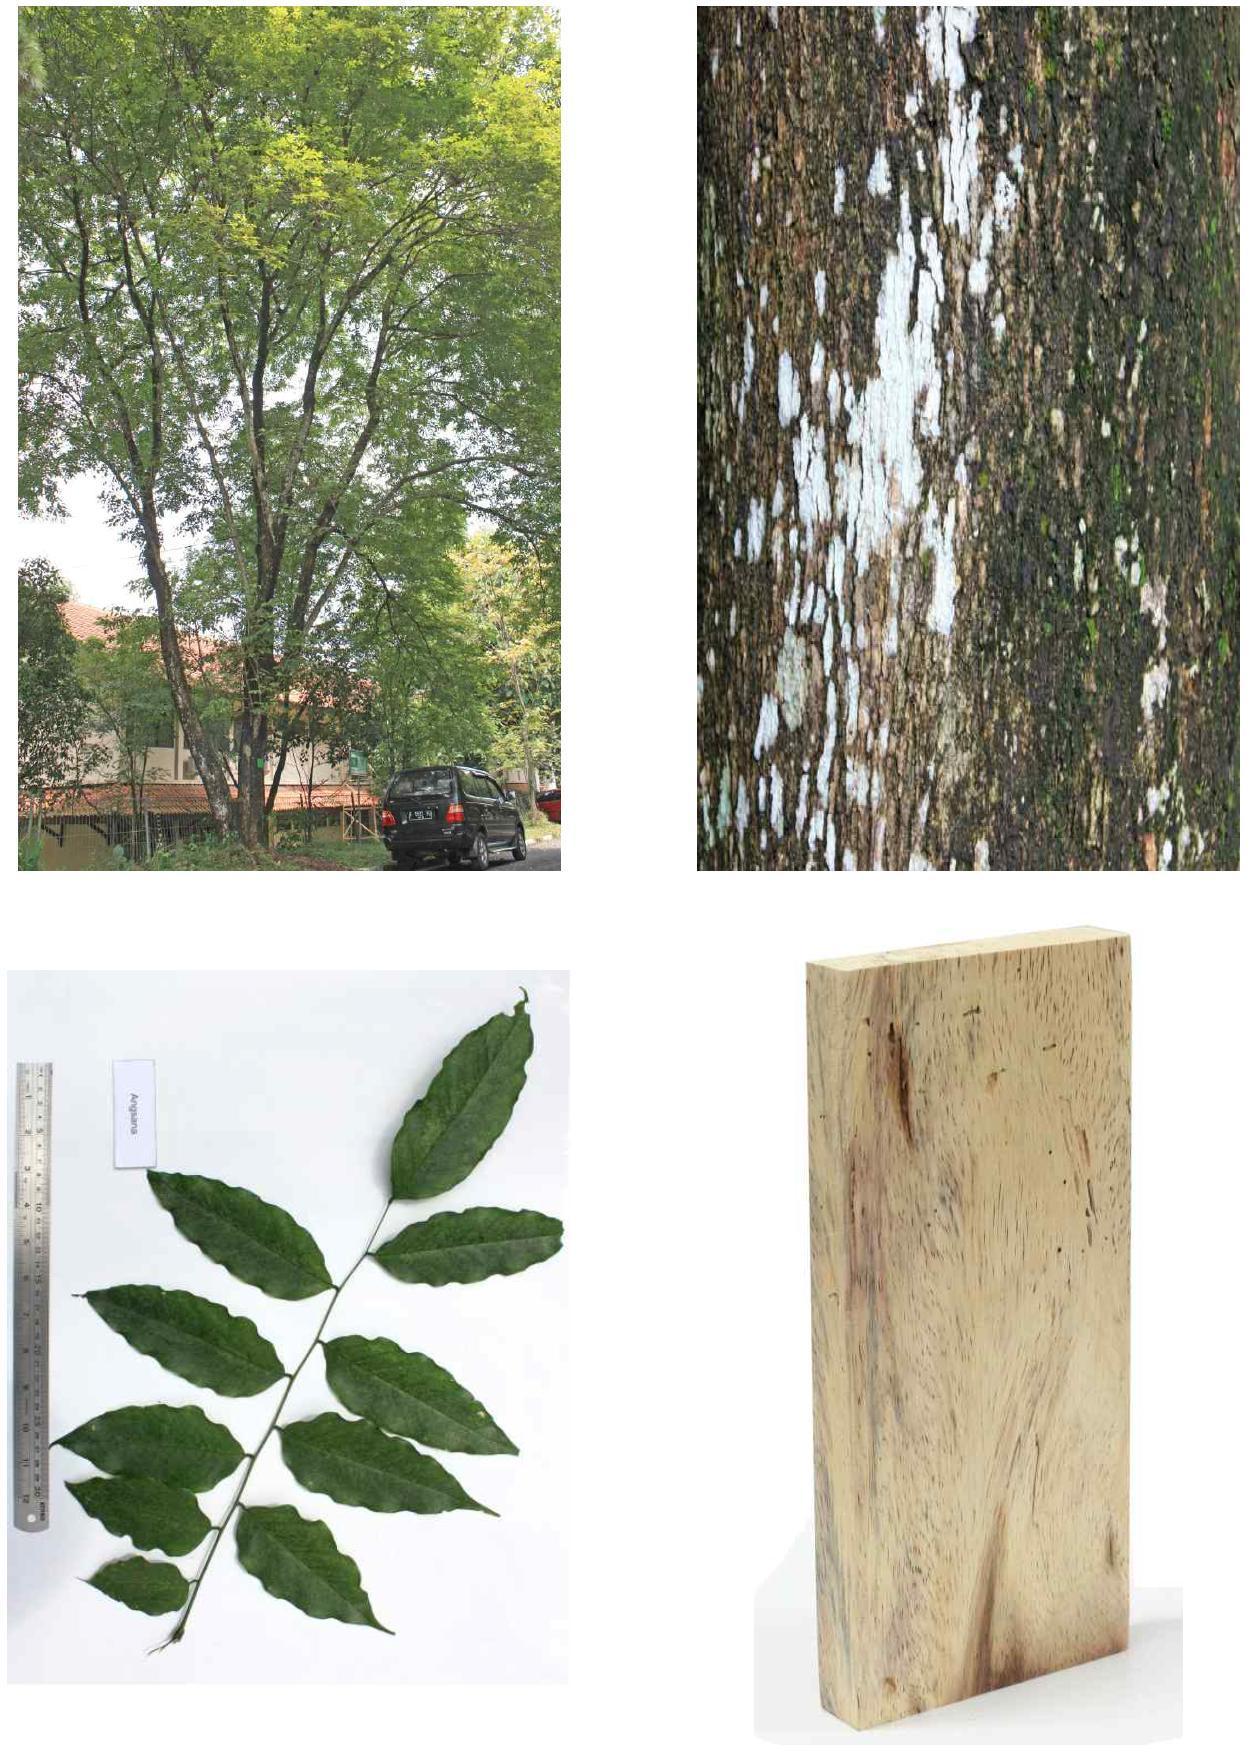 Angsana의 전체수형, 수피, 잎 및 재면.